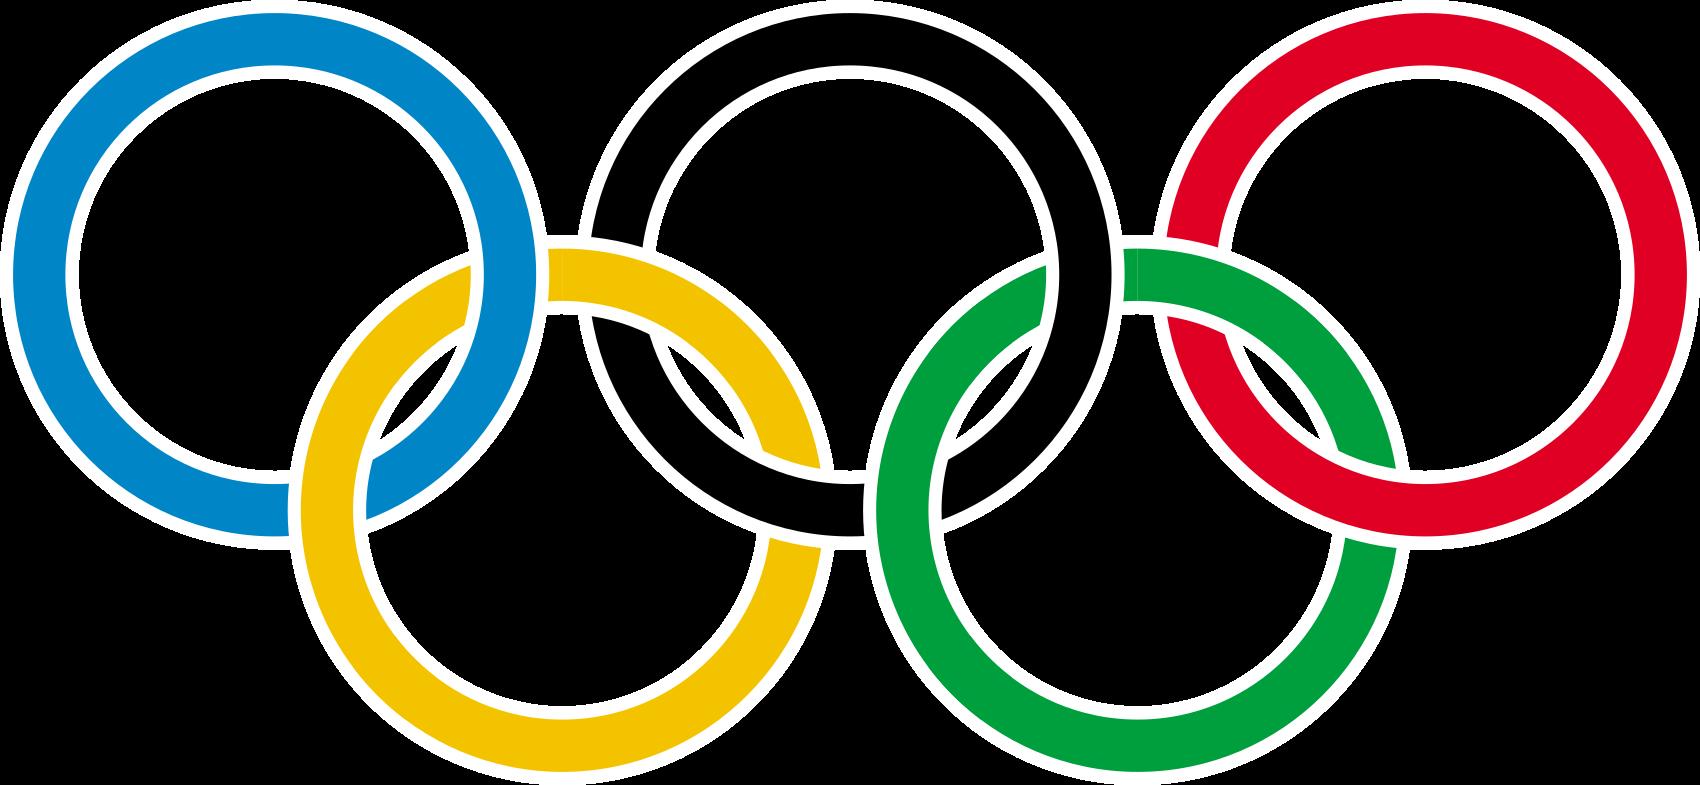 anel-olimpico-olimpiadas-2